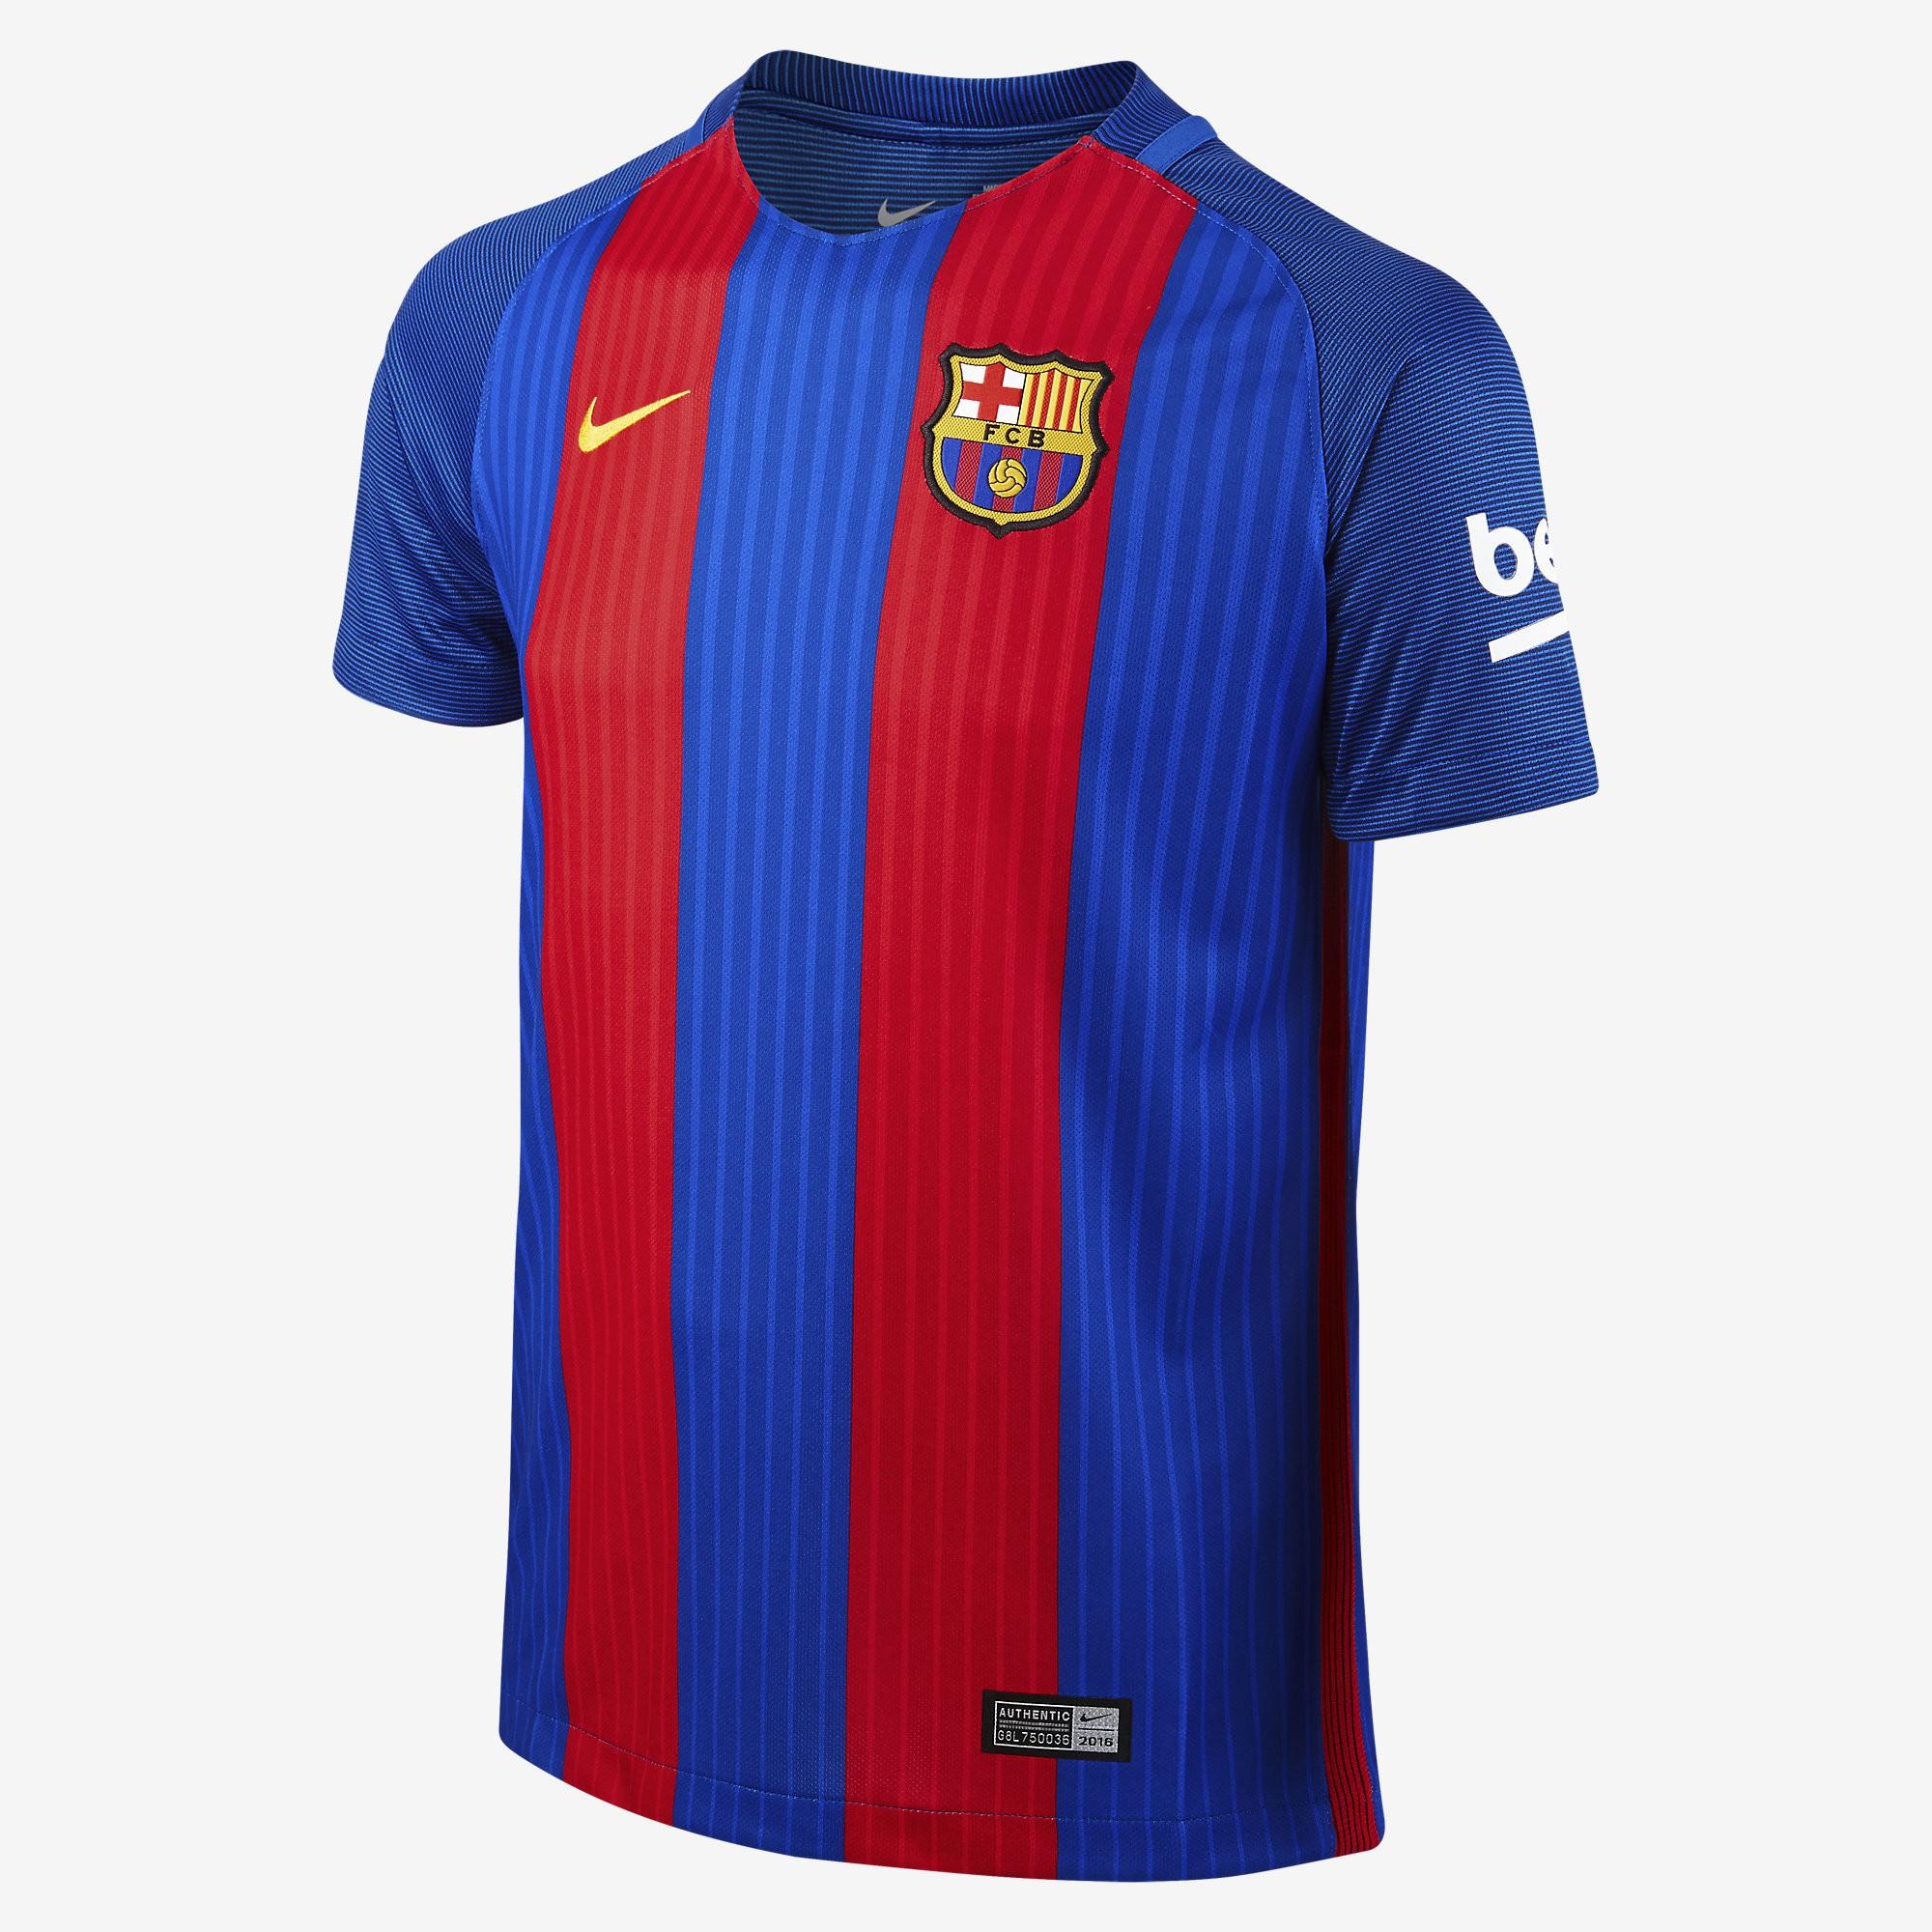 Camiseta Nike FC Barcelona 16-17 Local Junior 777029 481 - Deportes  Manzanedo 453bc5f0333